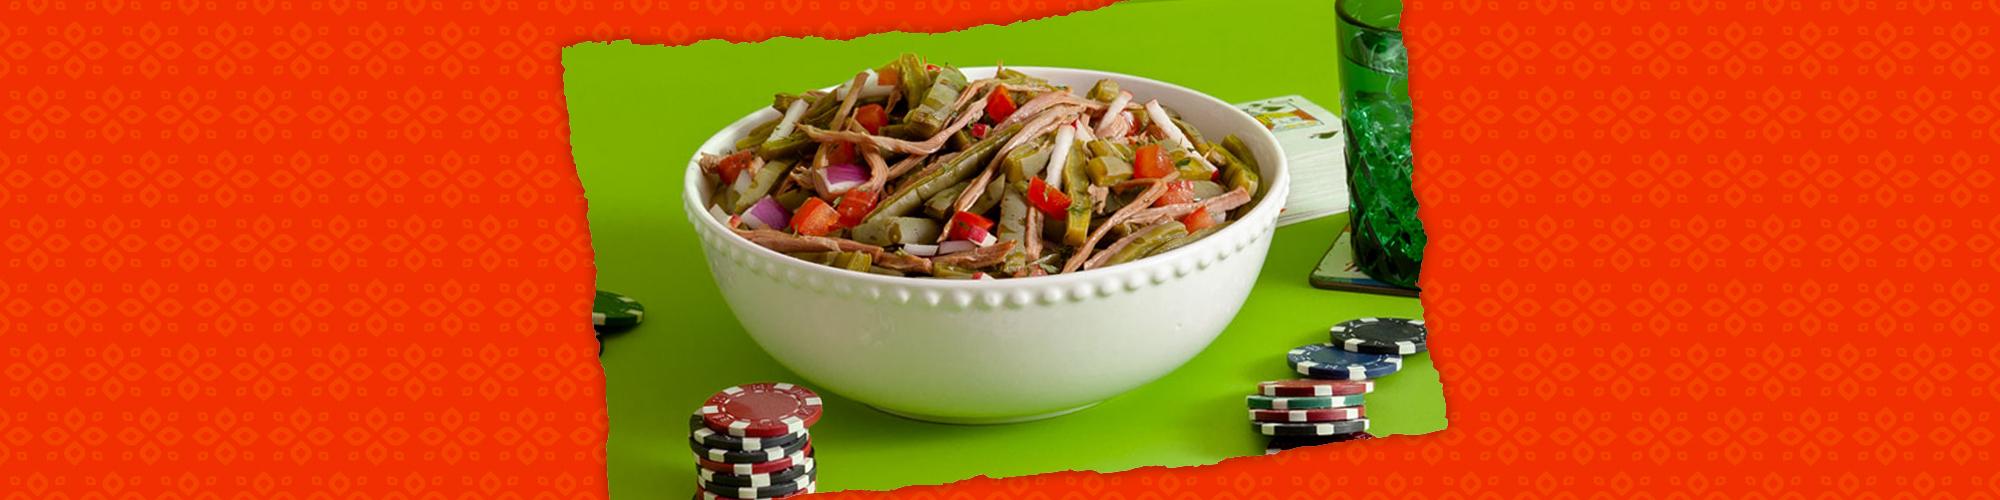 salsas shredded beef nopalitos